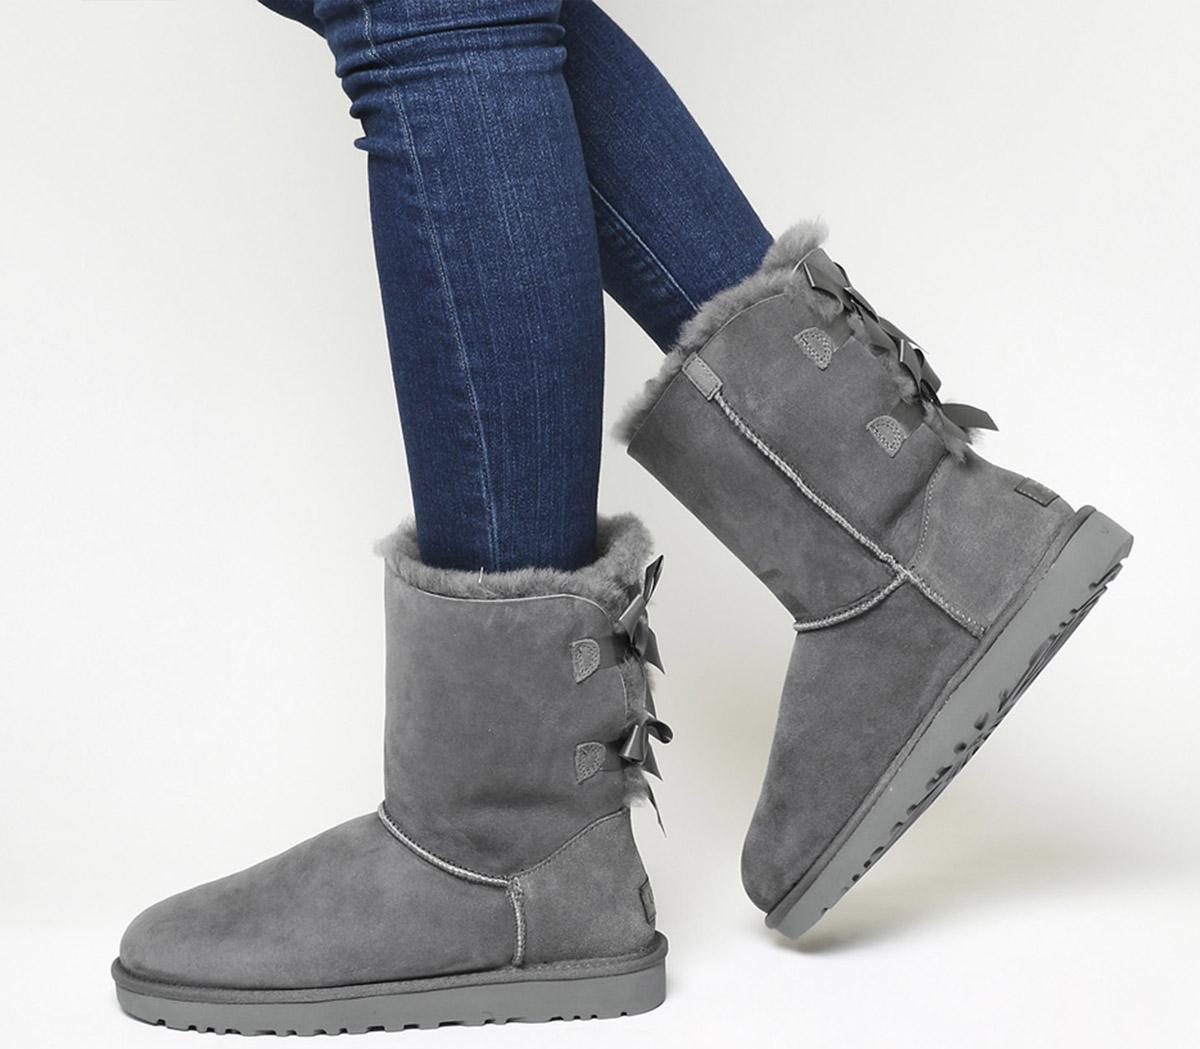 UGG Bailey Bow Ii Calf Boots Grey Suede